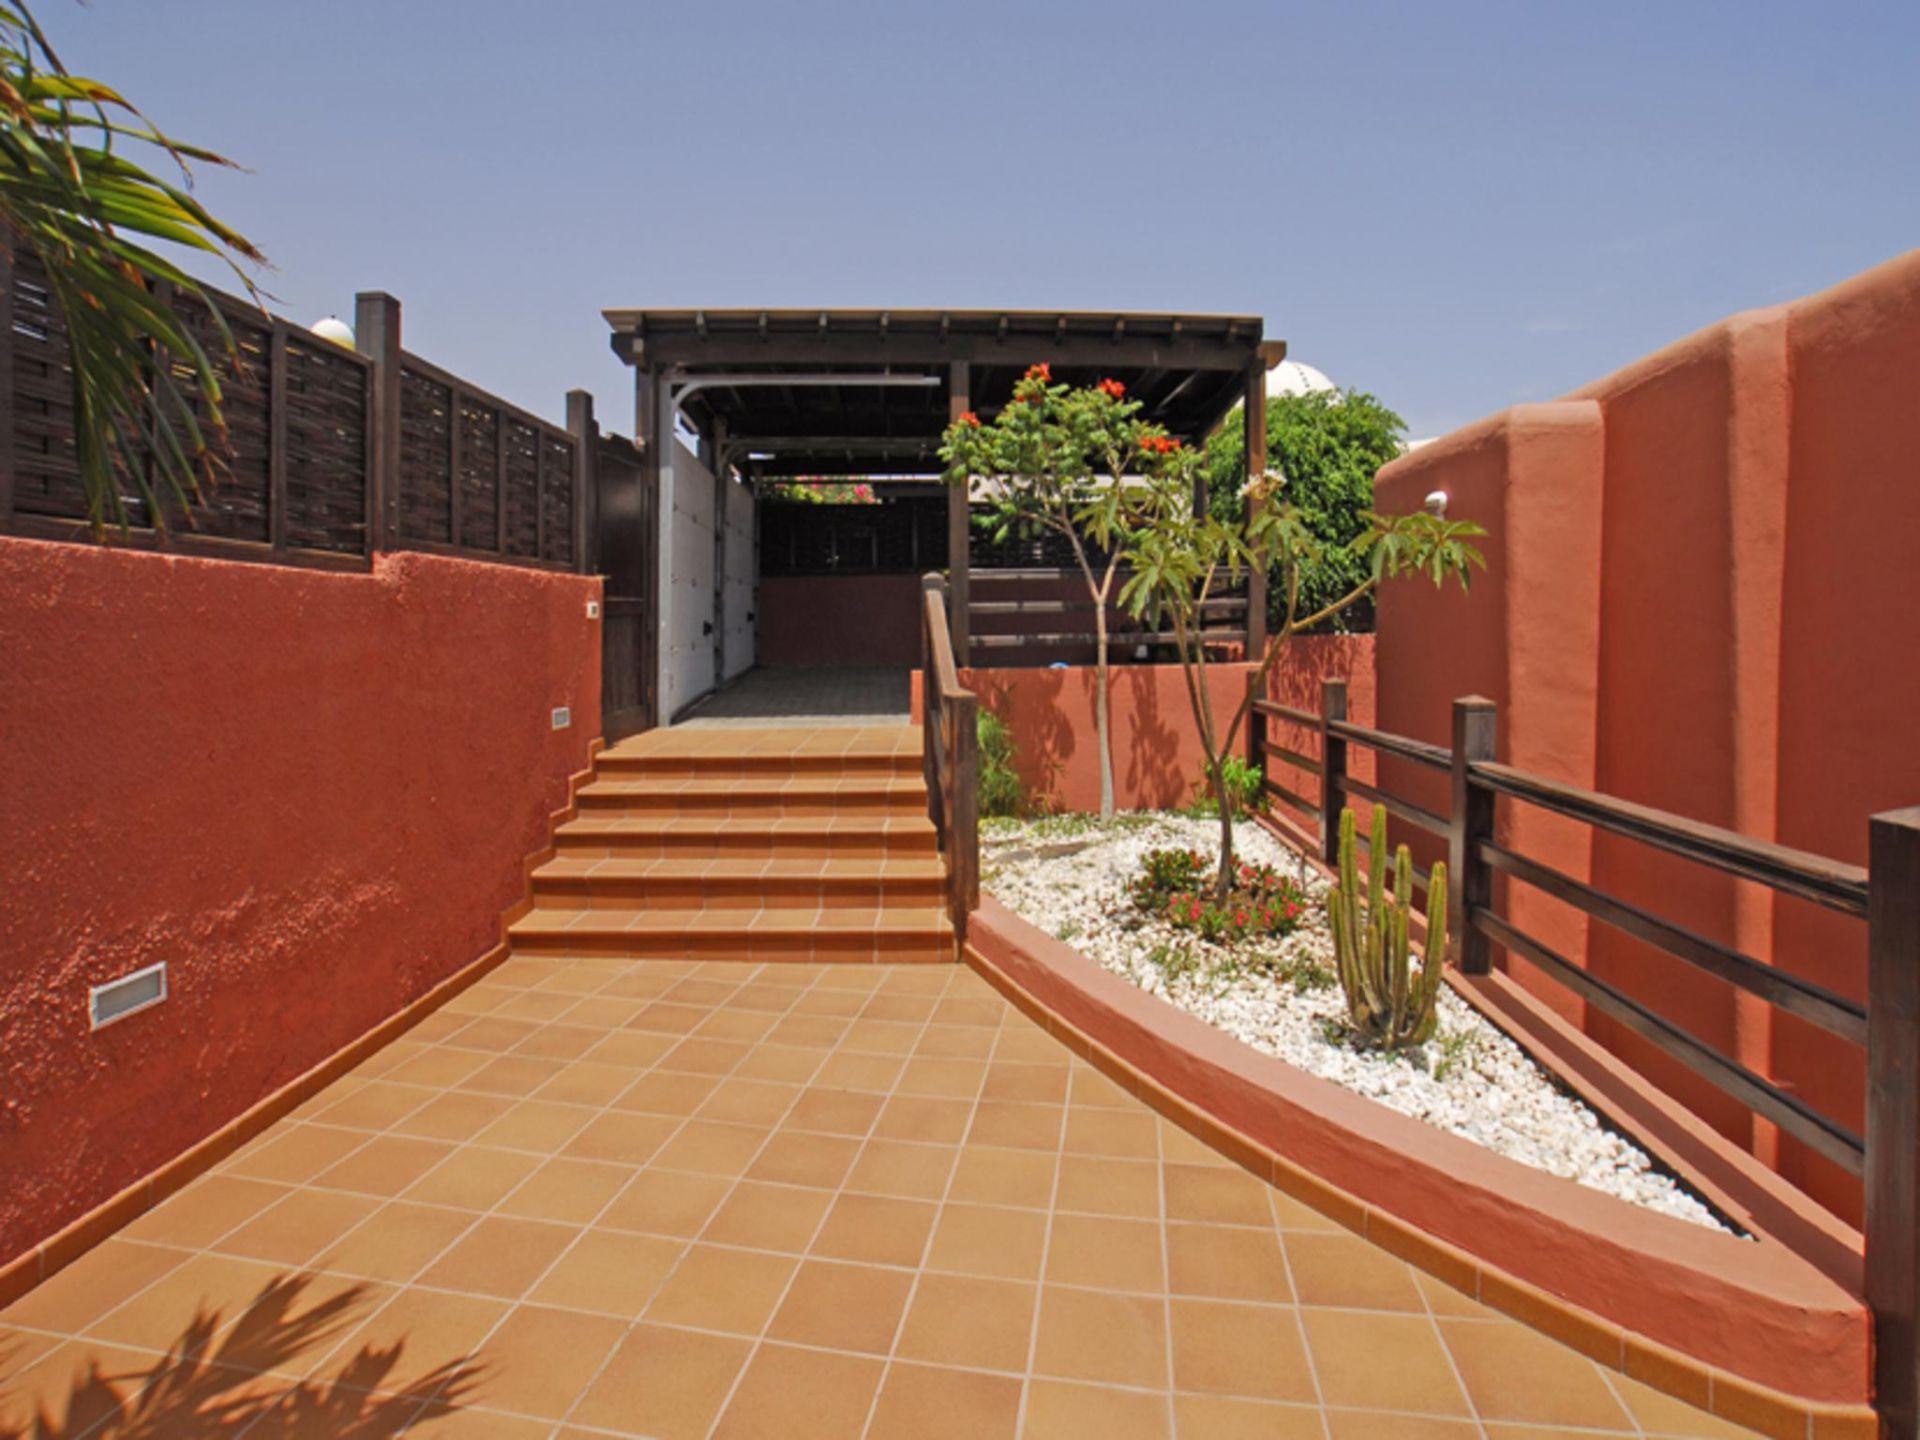 Holiday apartment Villa San Agustin 10 - Holiday Rental (854295), Maspalomas, Gran Canaria, Canary Islands, Spain, picture 37